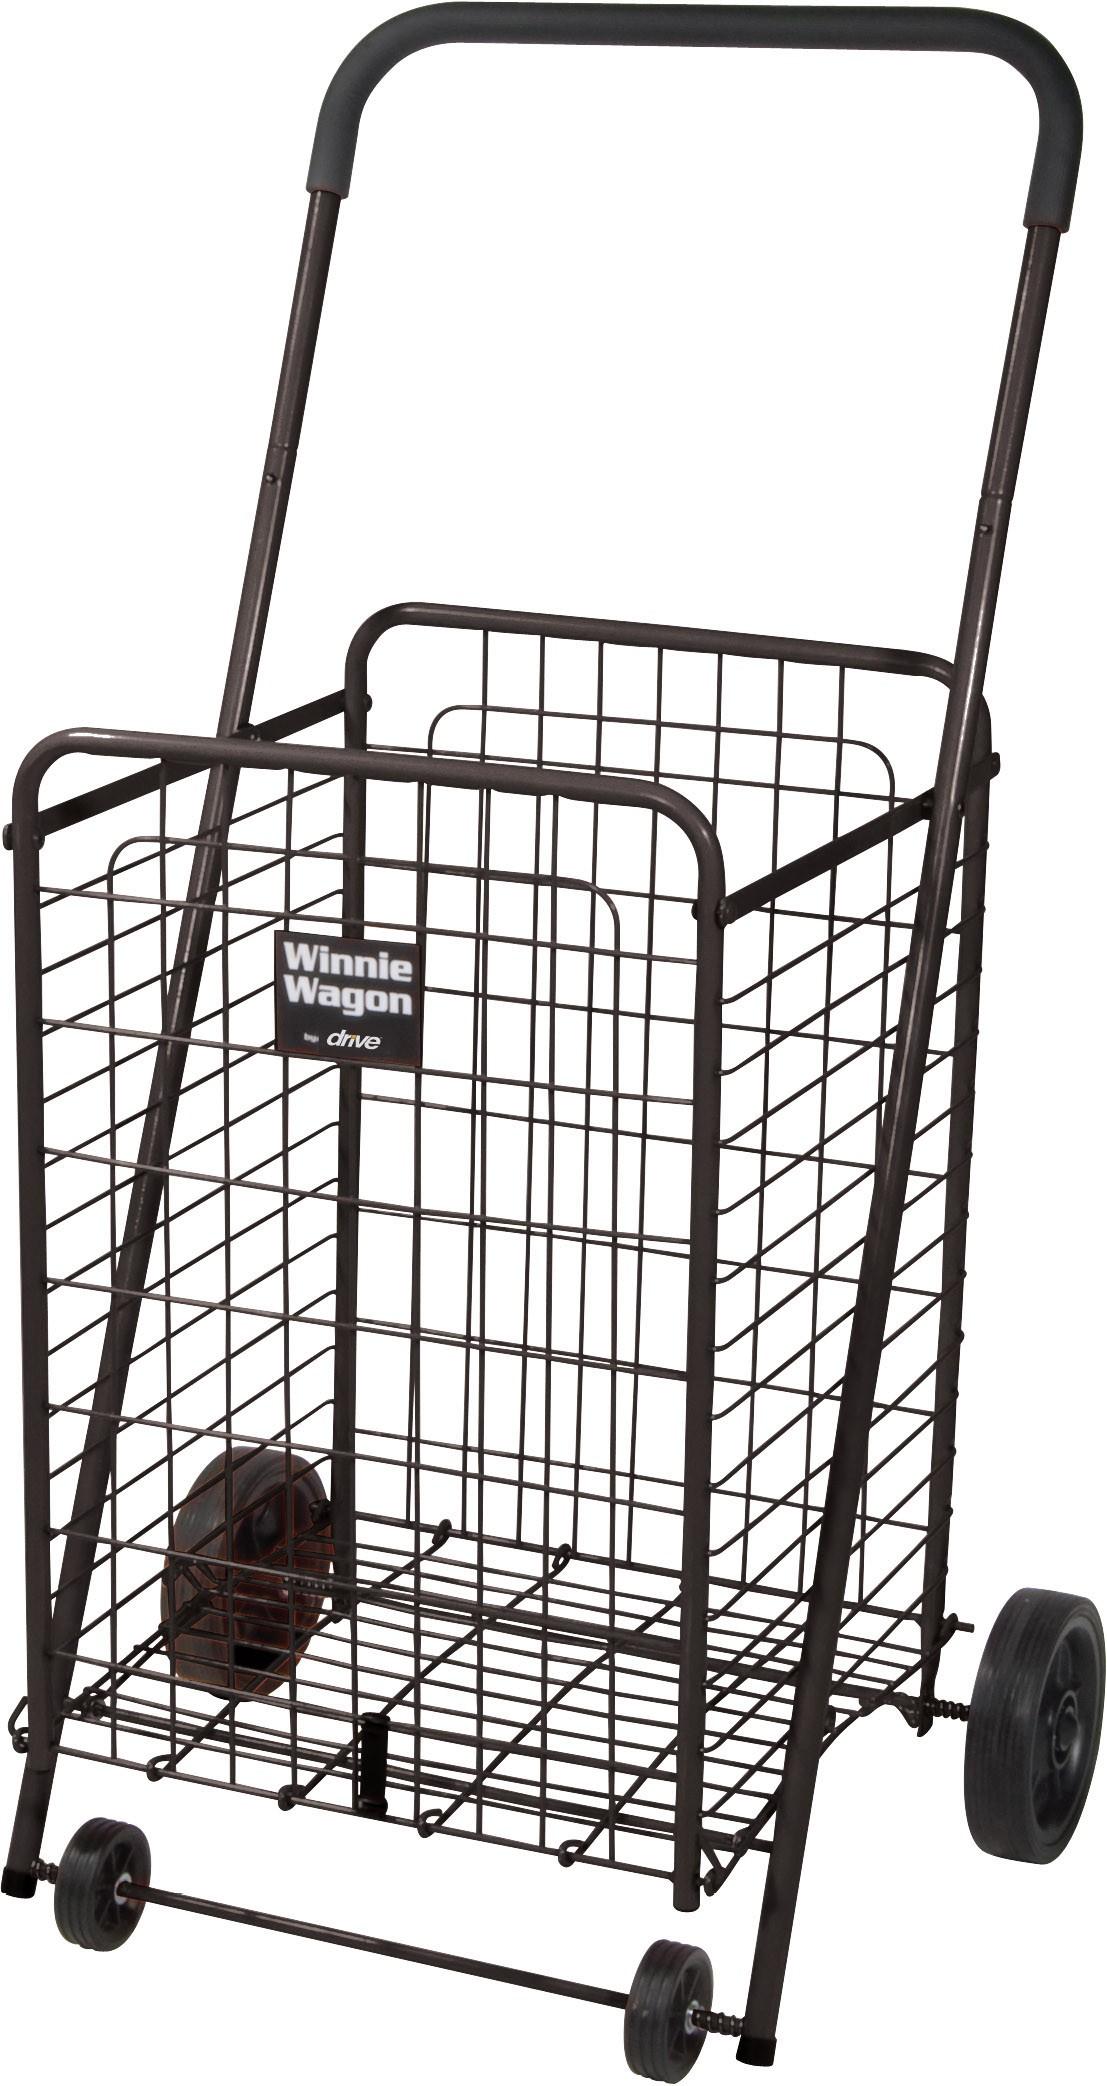 Winnie Wagon With Adjustable Handle Height